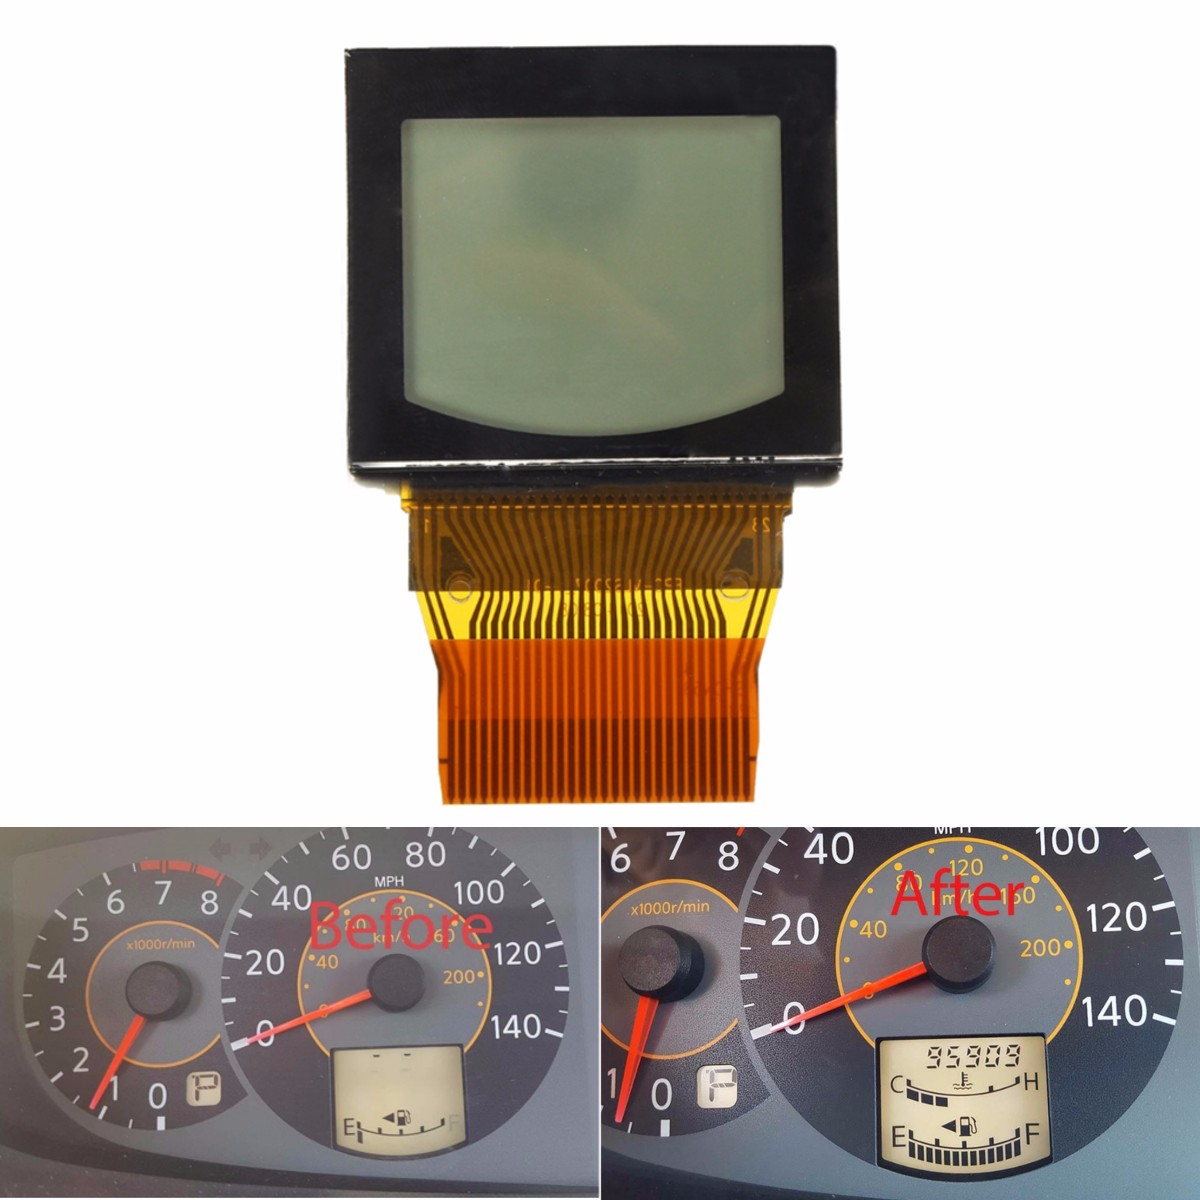 Generic Cluster Odometer Speedometer LCD Display Screen for